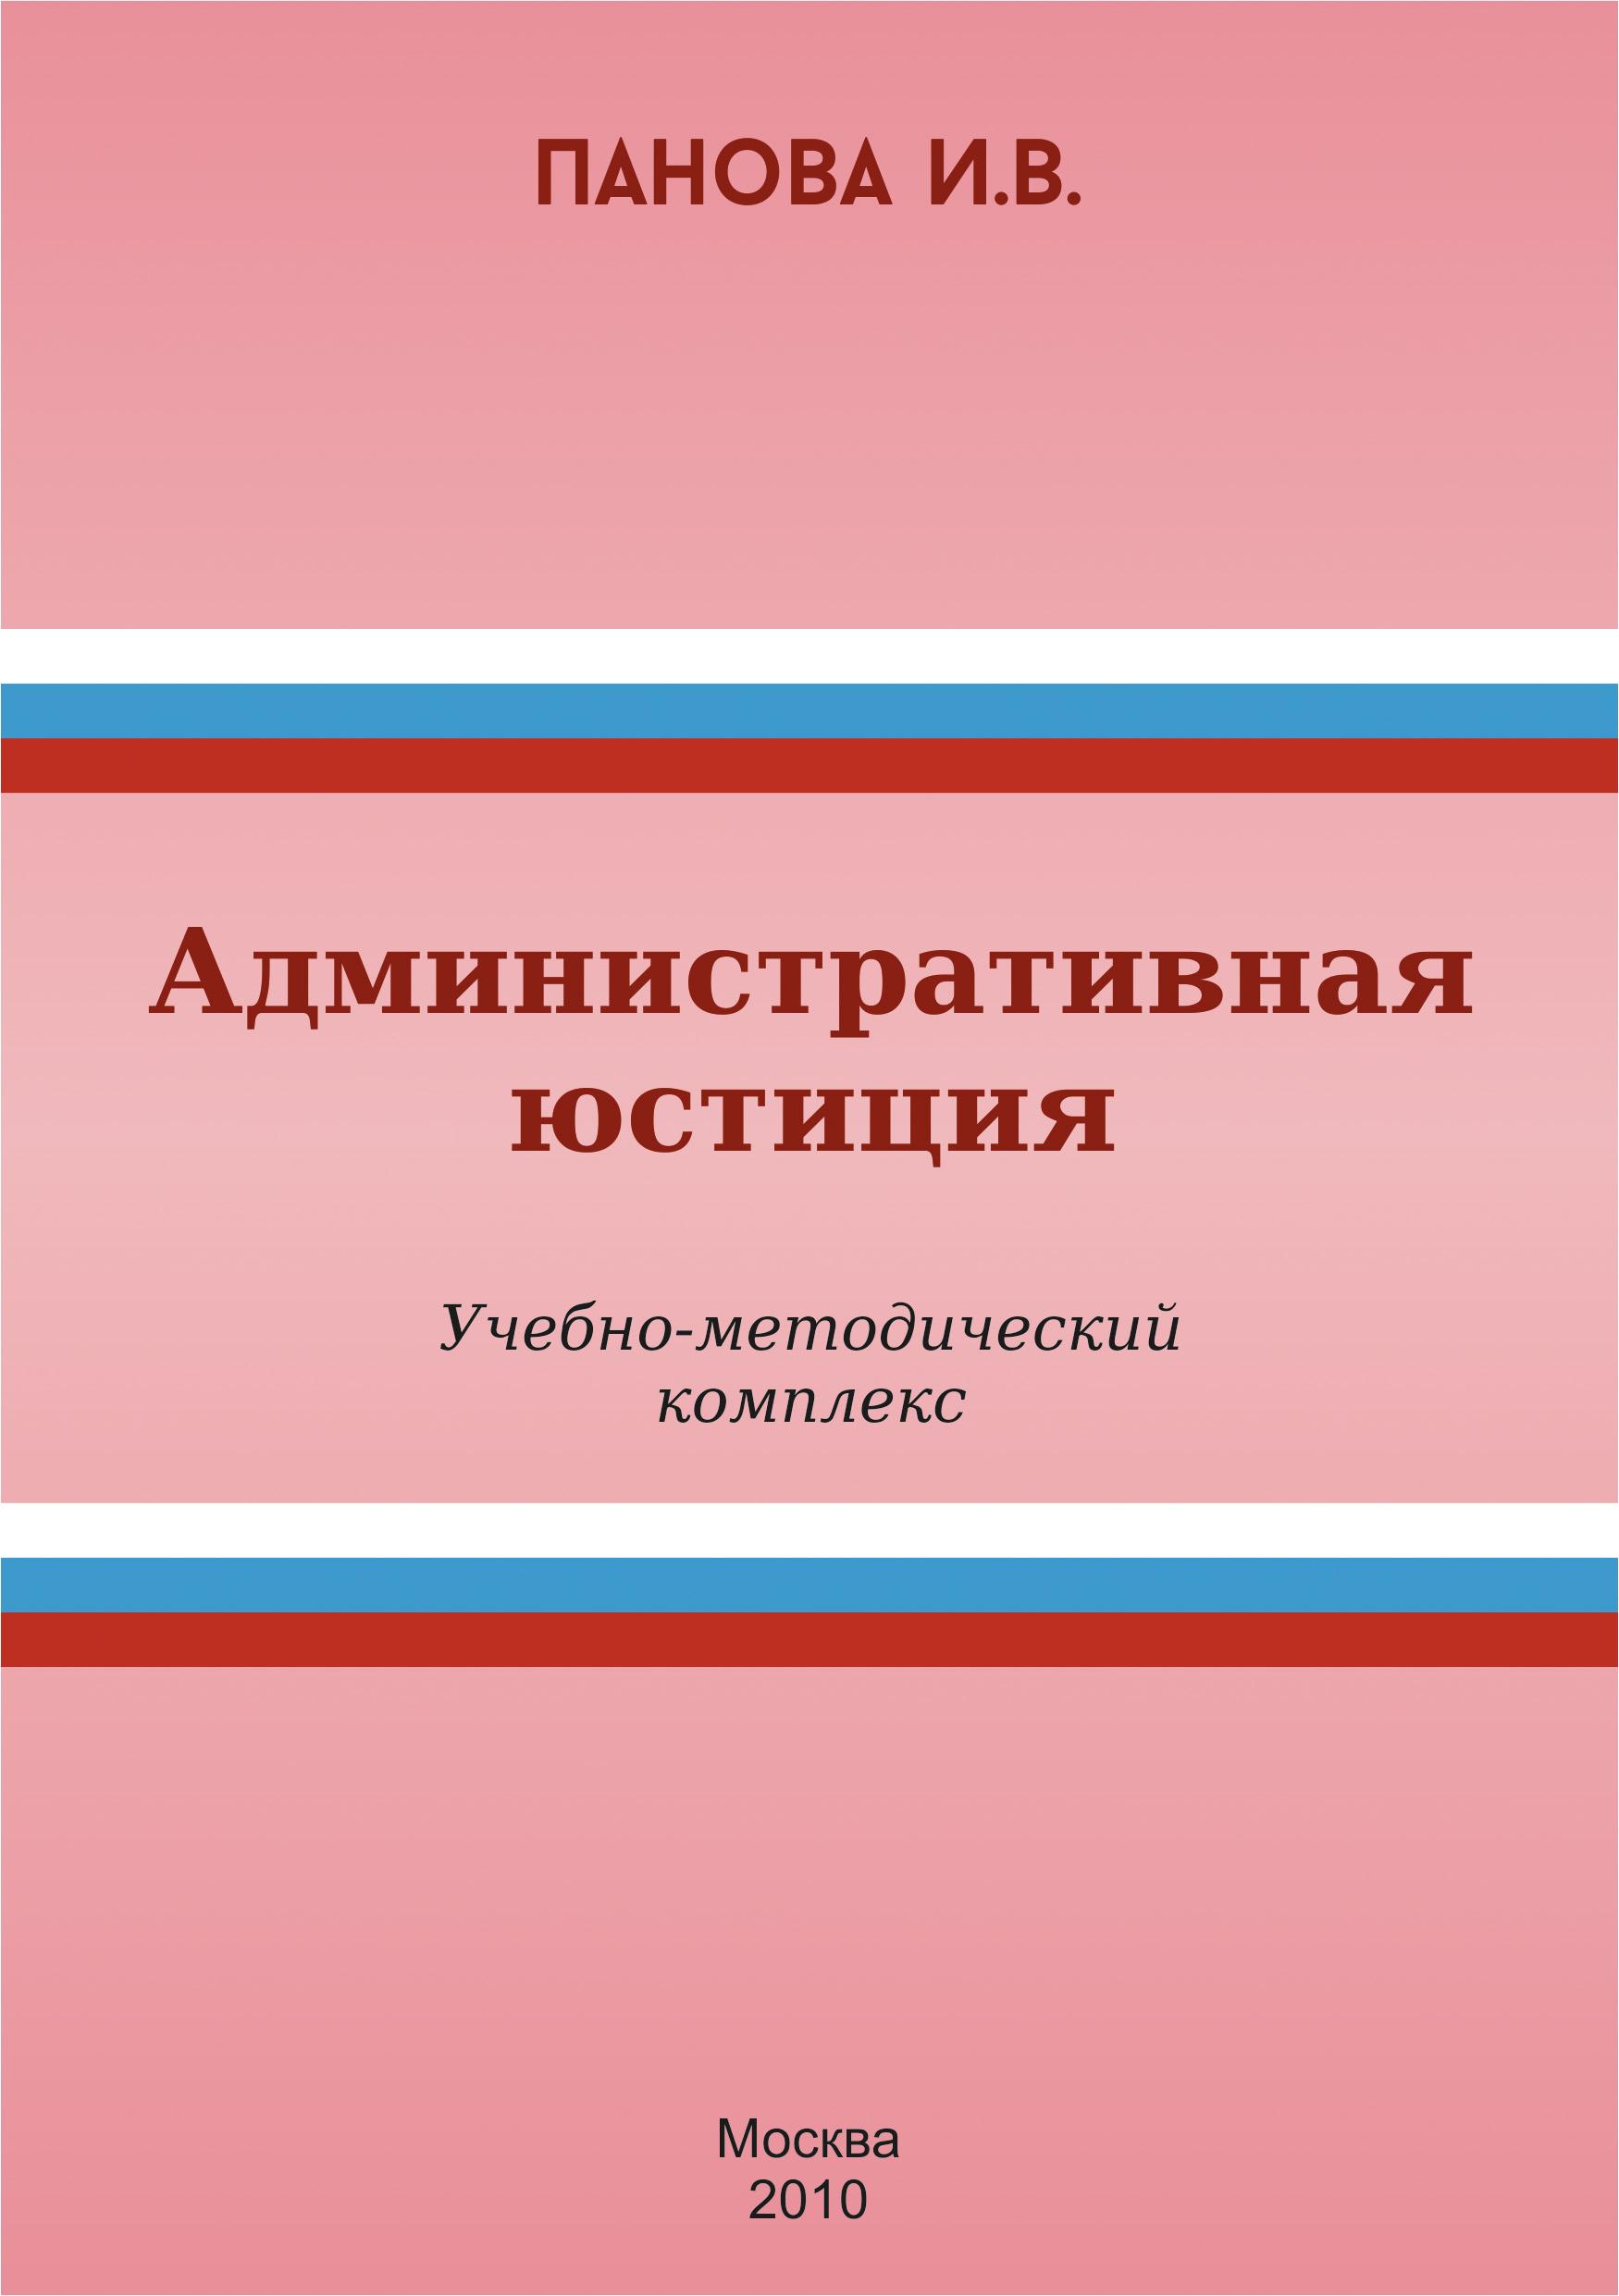 Юстиция — что это такое | ktonanovenkogo.ru